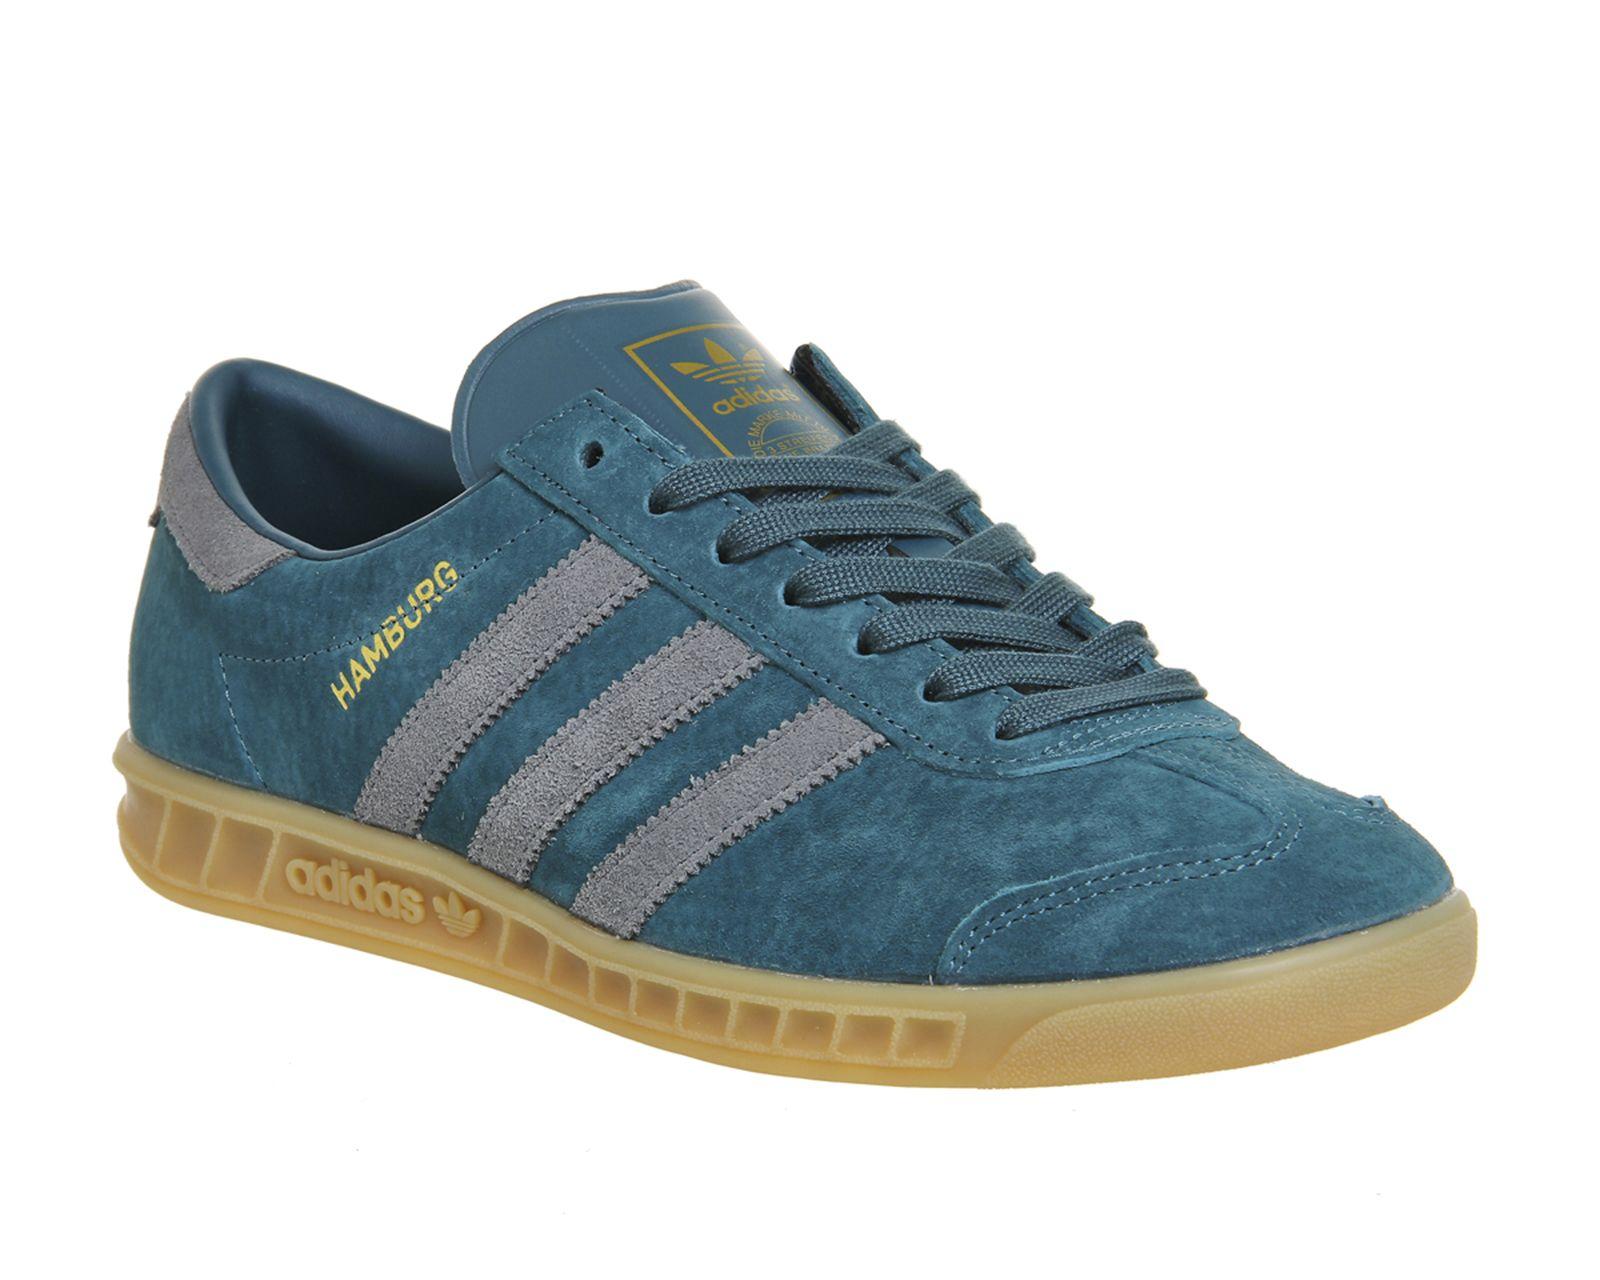 Adidas Hamburg Viridian Vista Grey Gum Exclusive - His trainers ...